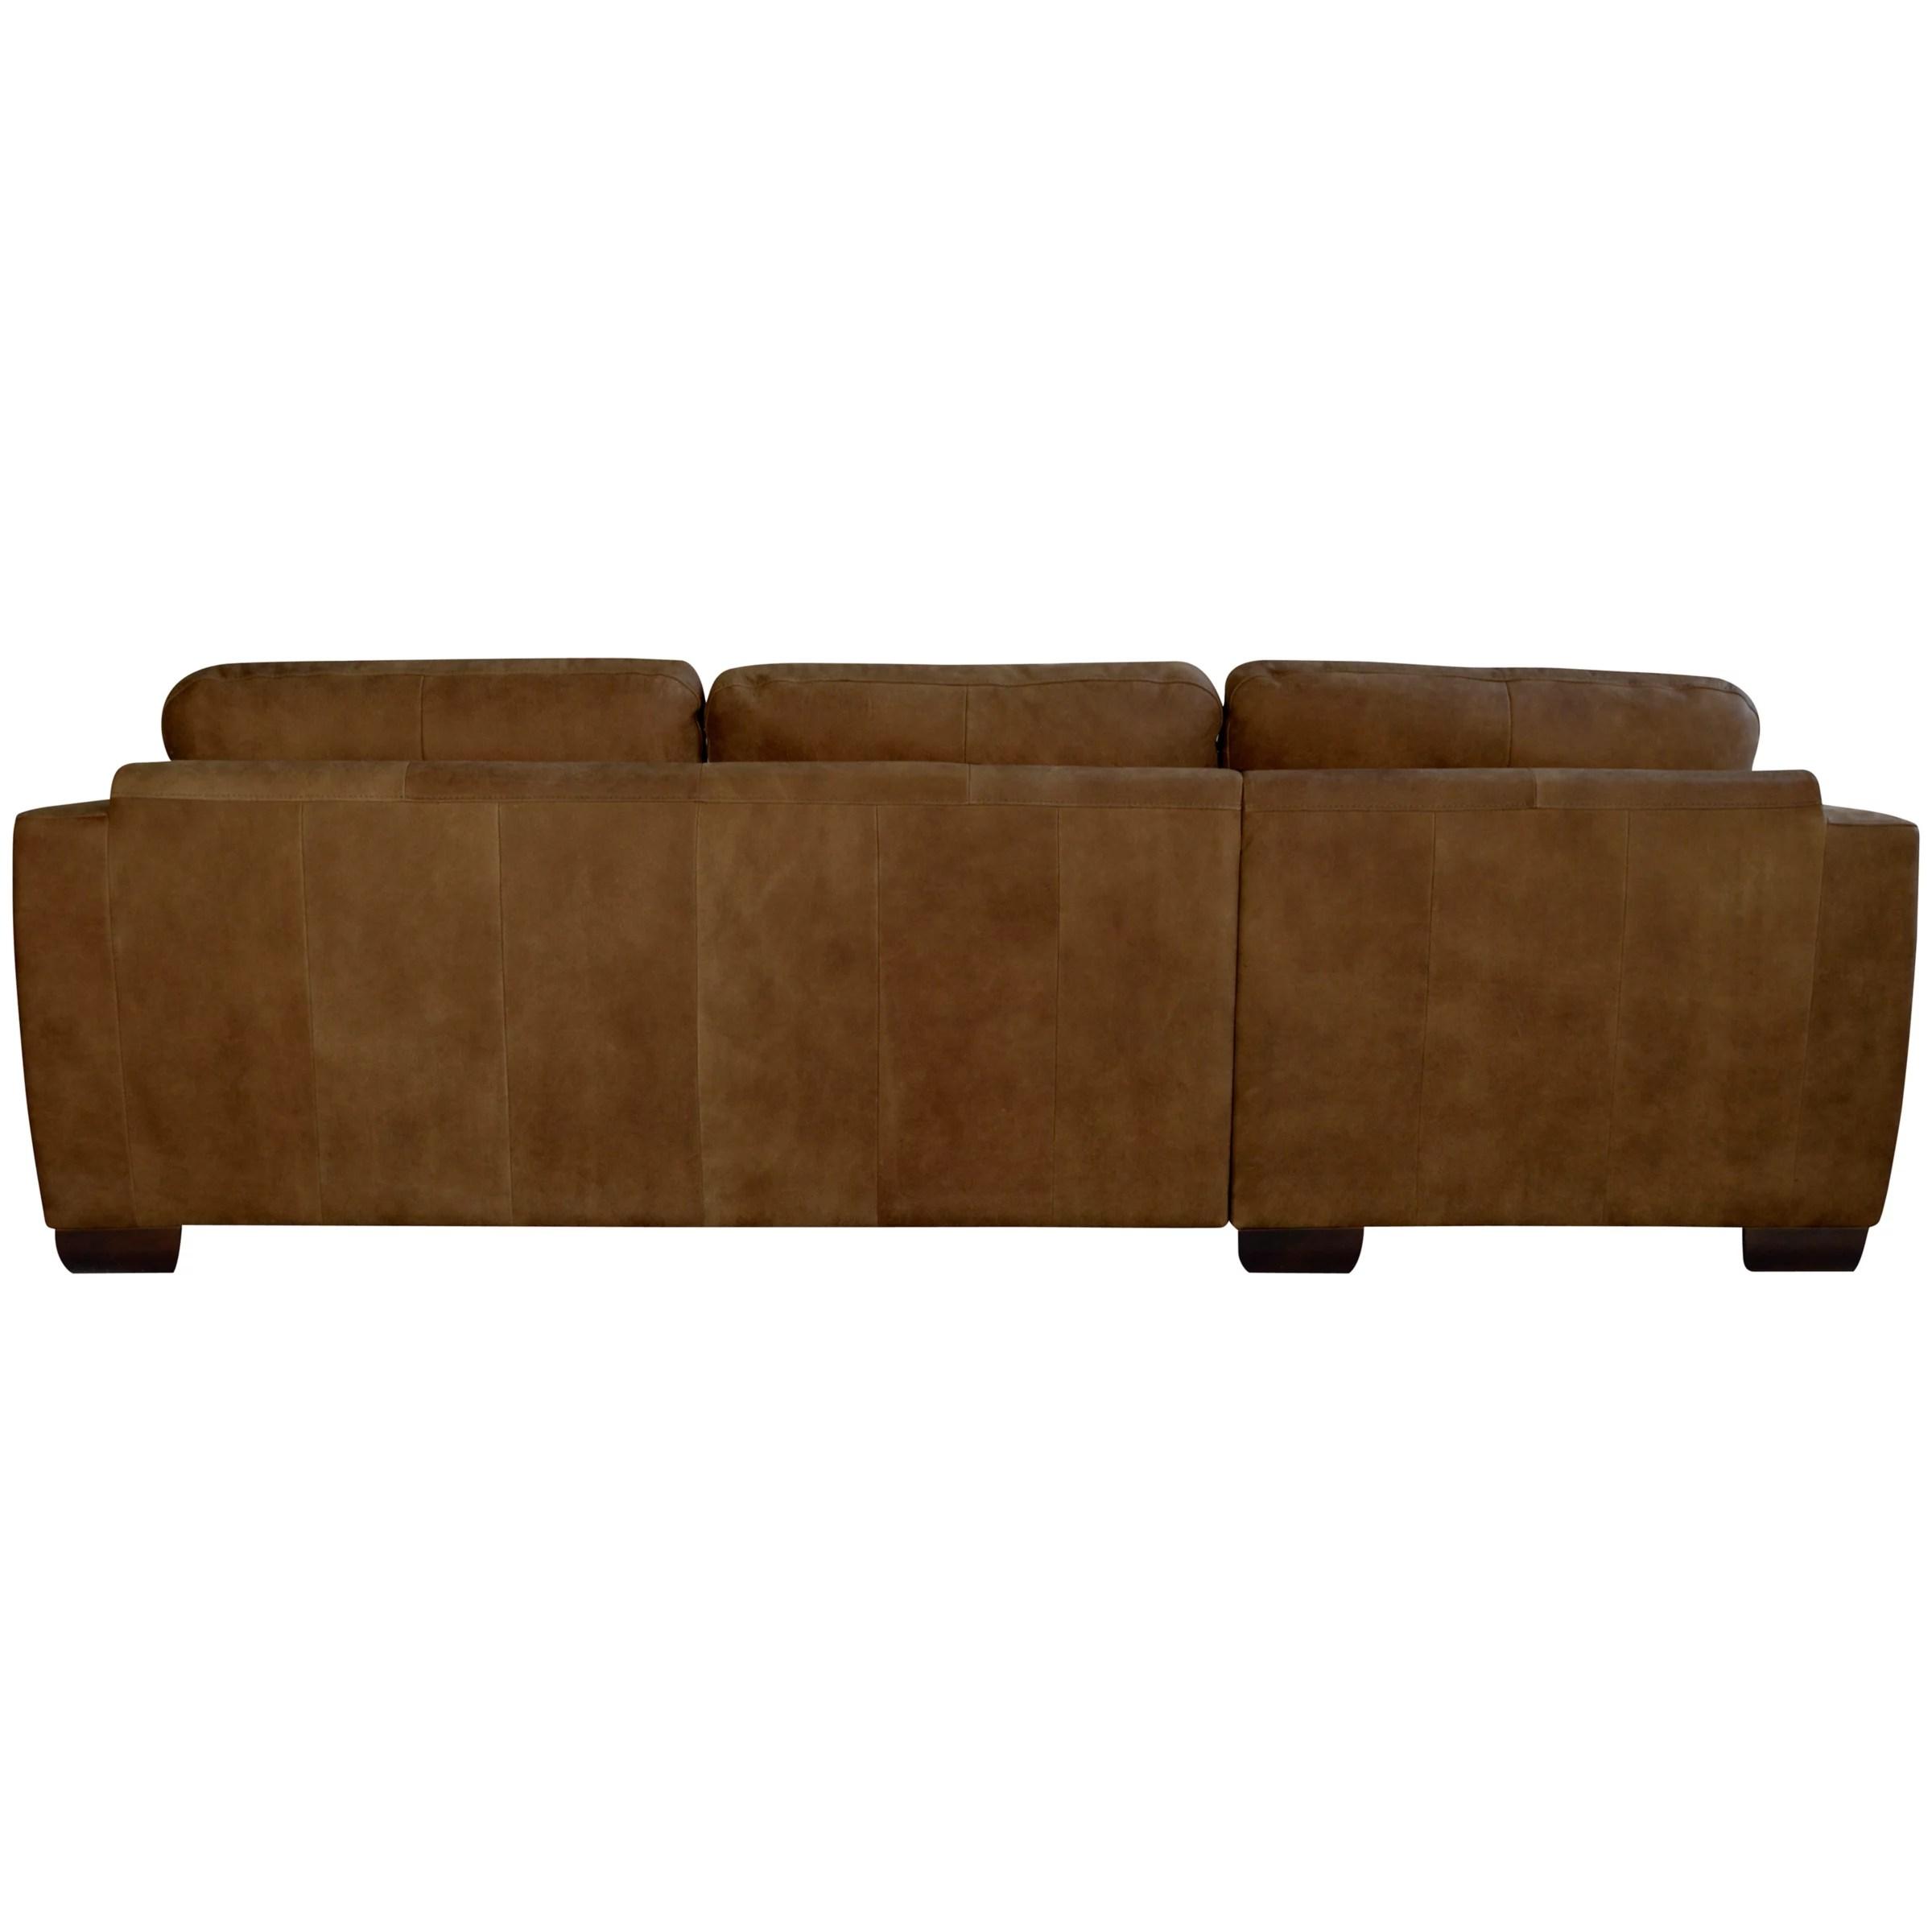 felix leather lh corner chaise sofa sofaware s box john lewis lhf ashanti at